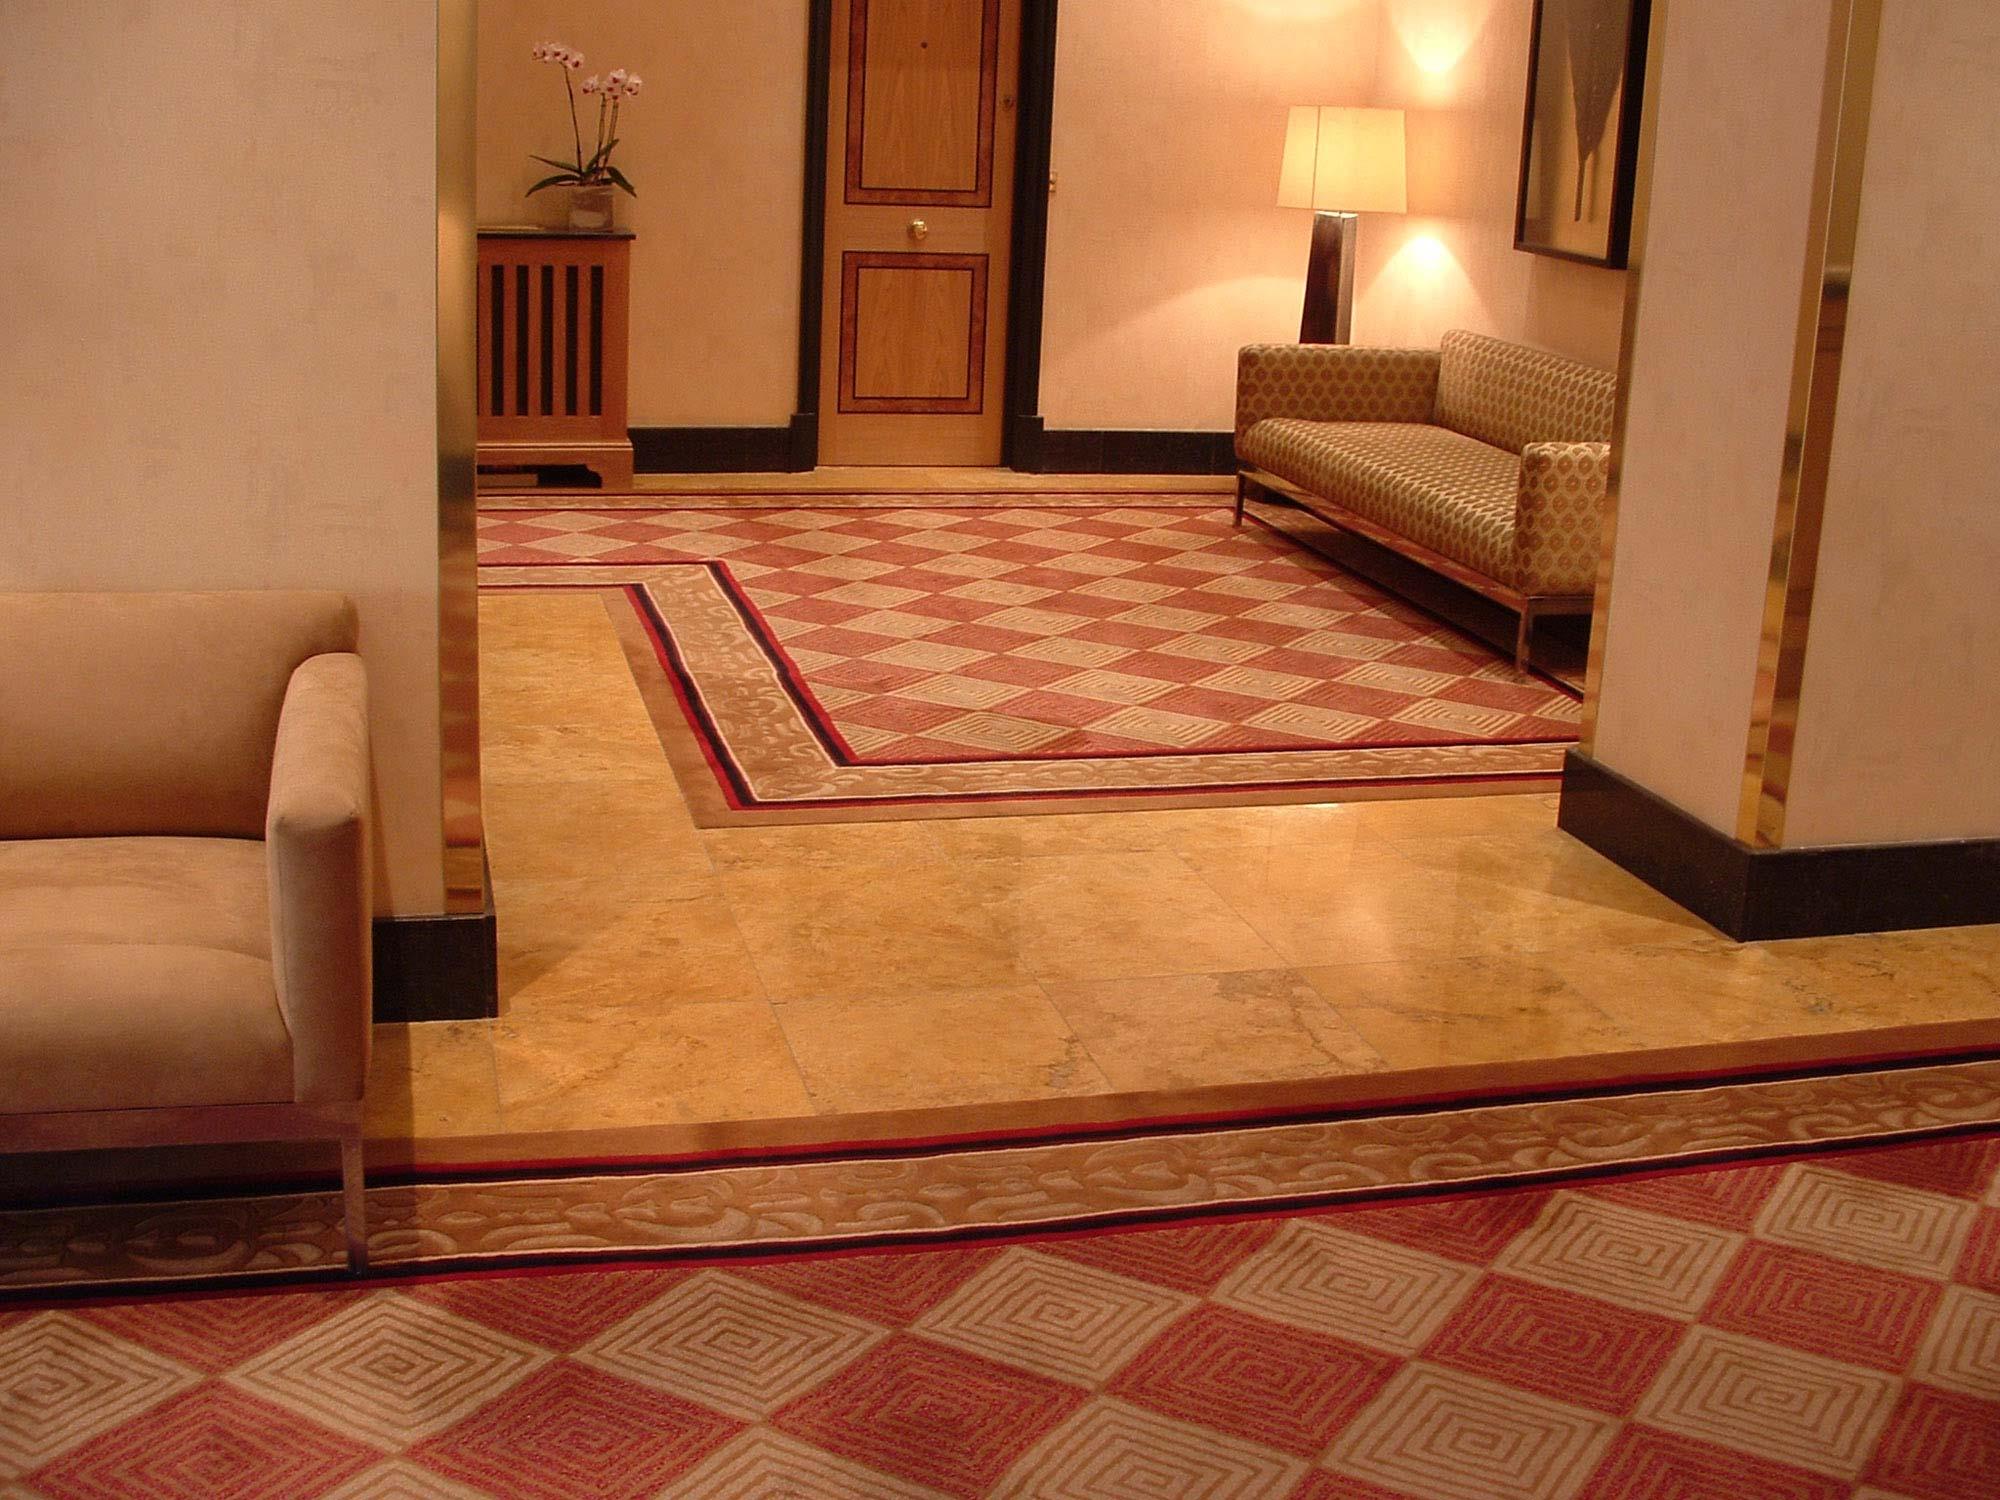 Custom Hand Tufted Carpet